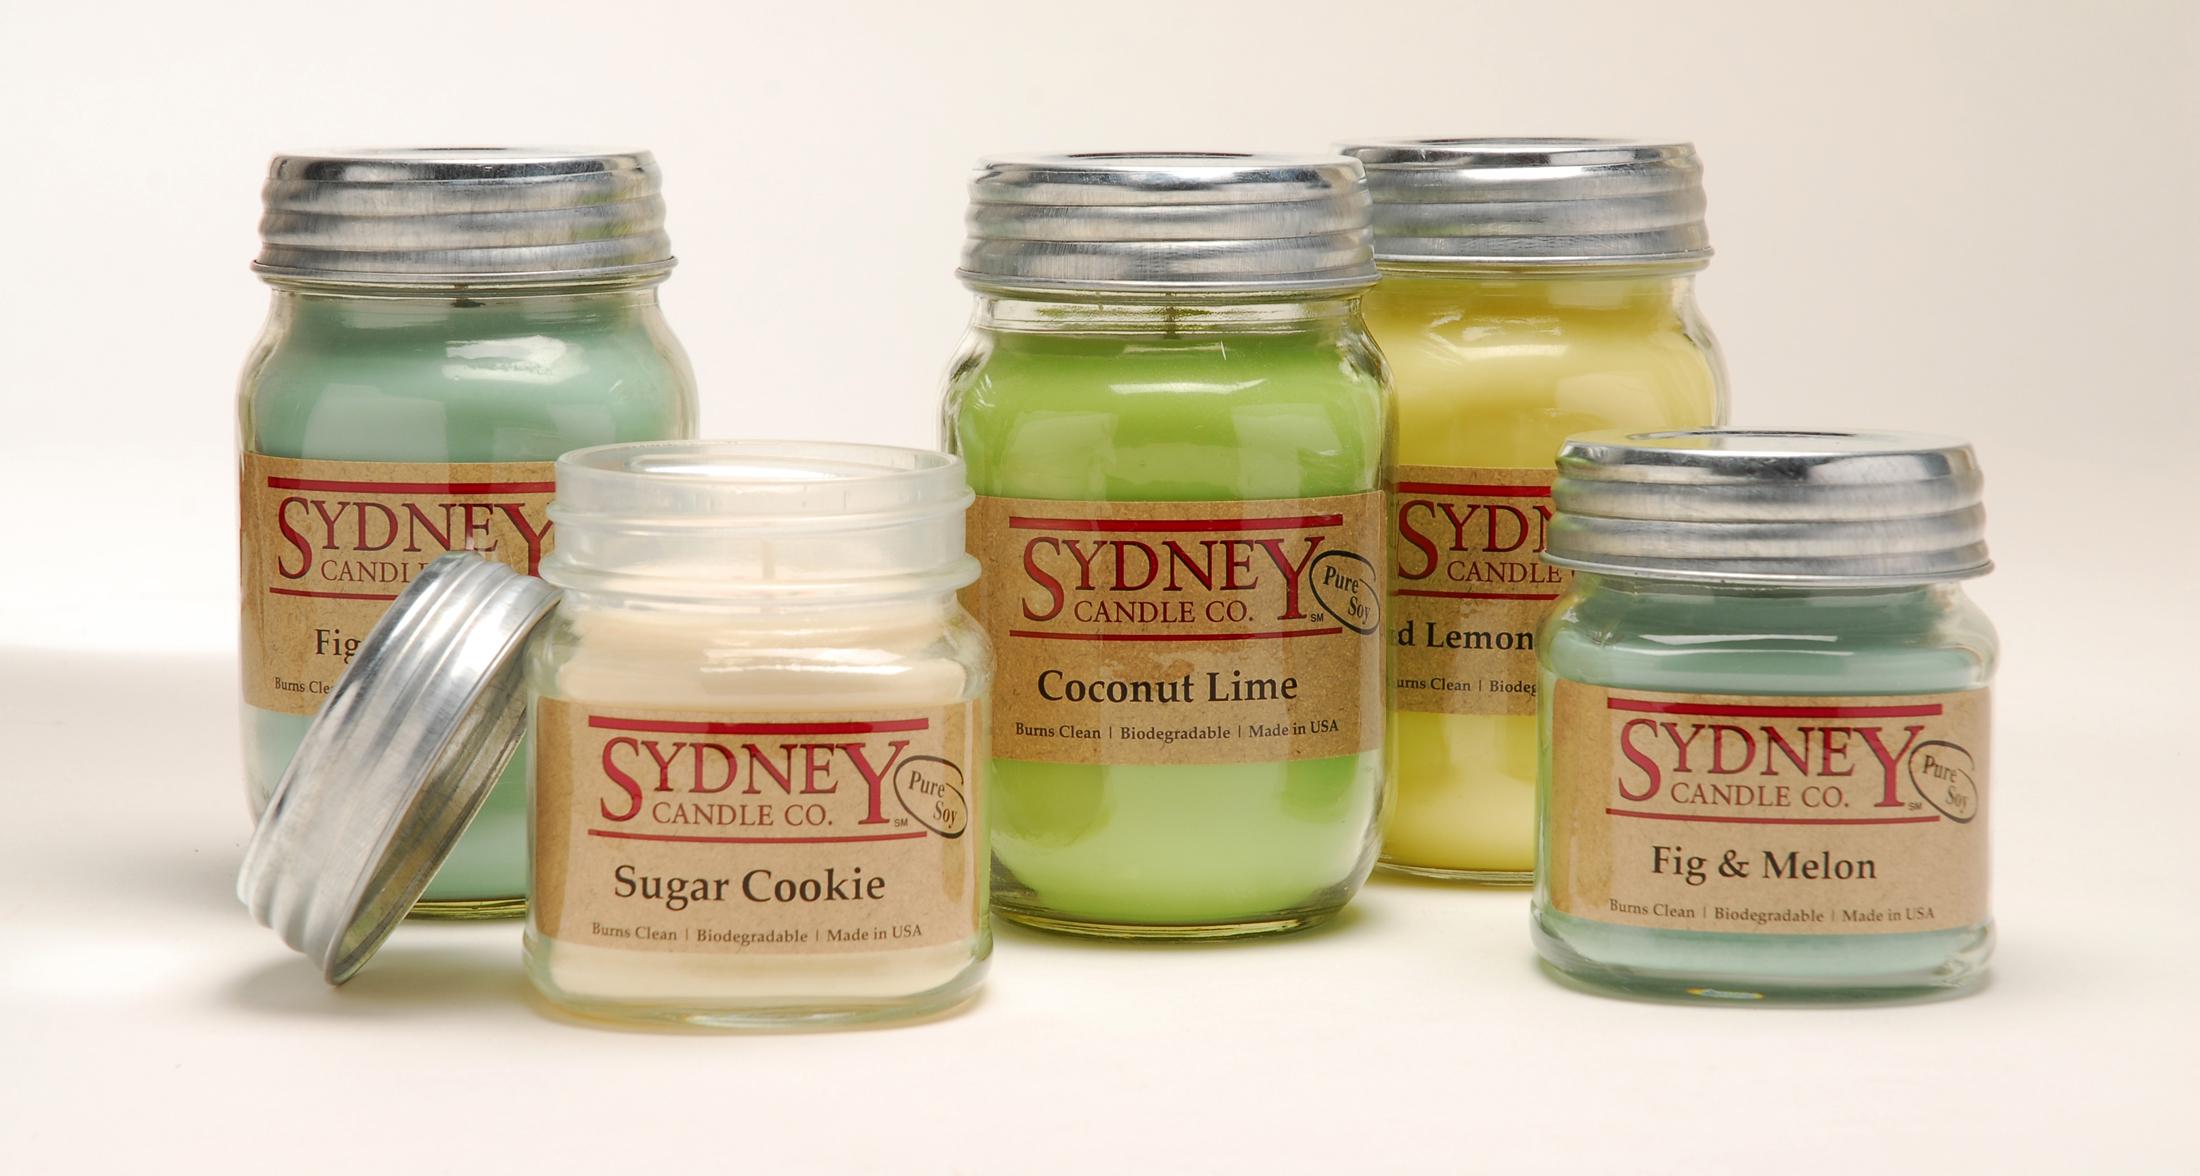 Sydney Candles